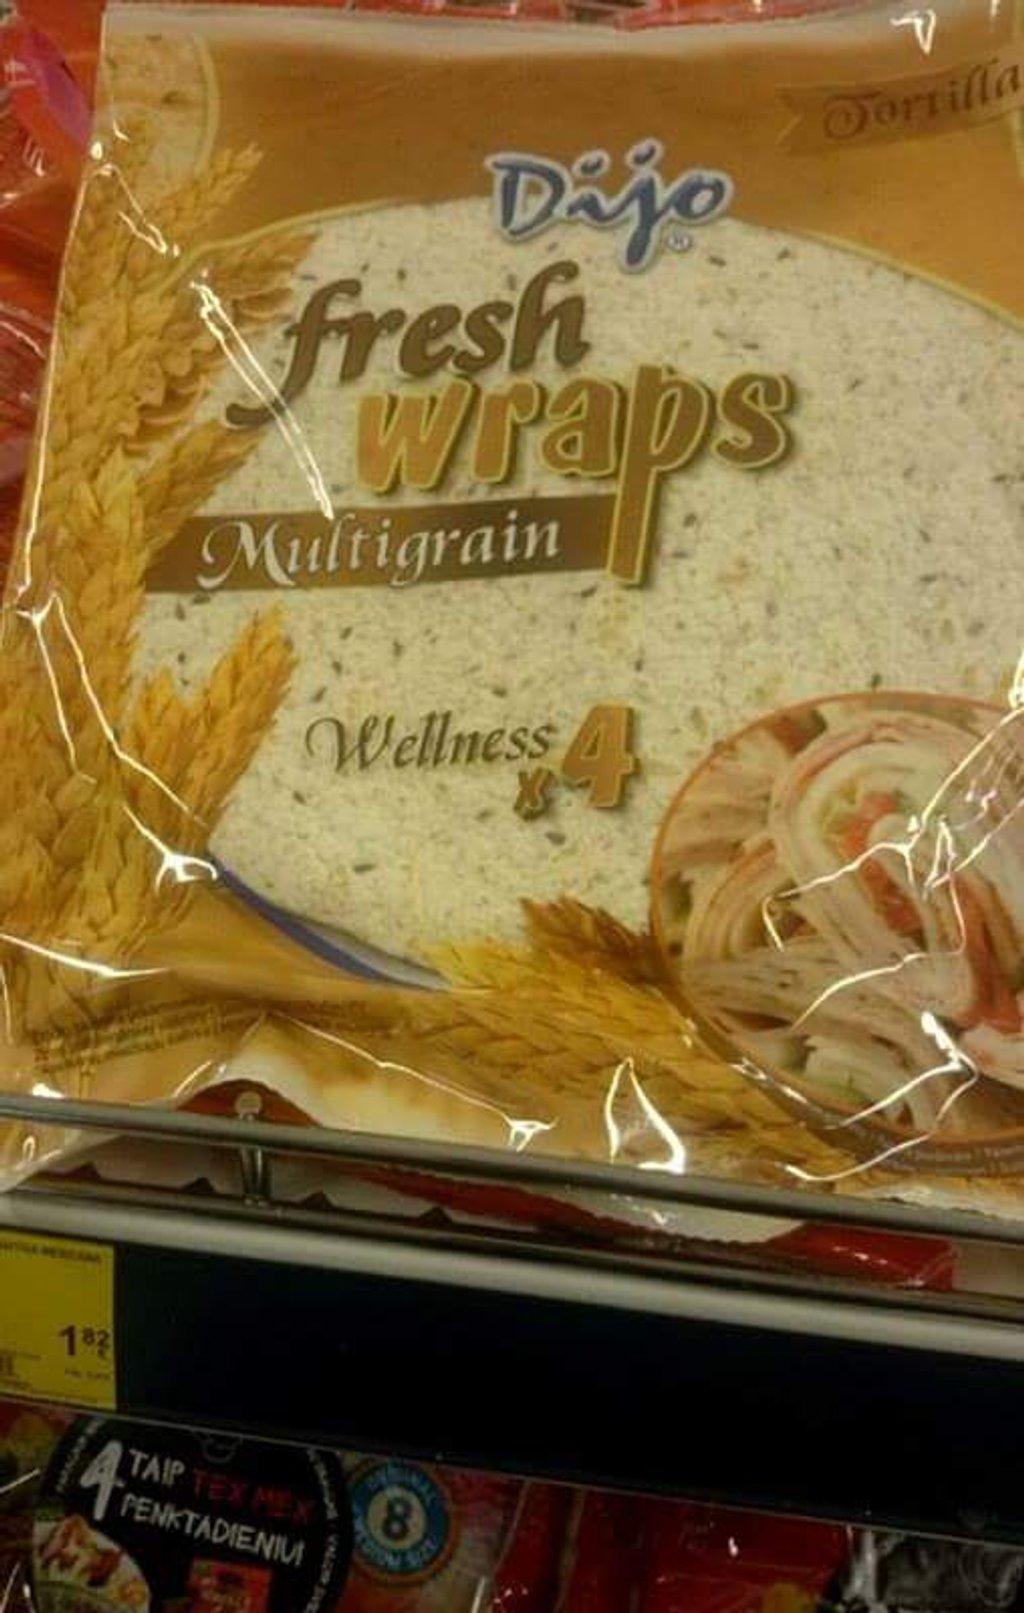 Mc'wrappin by icetiz